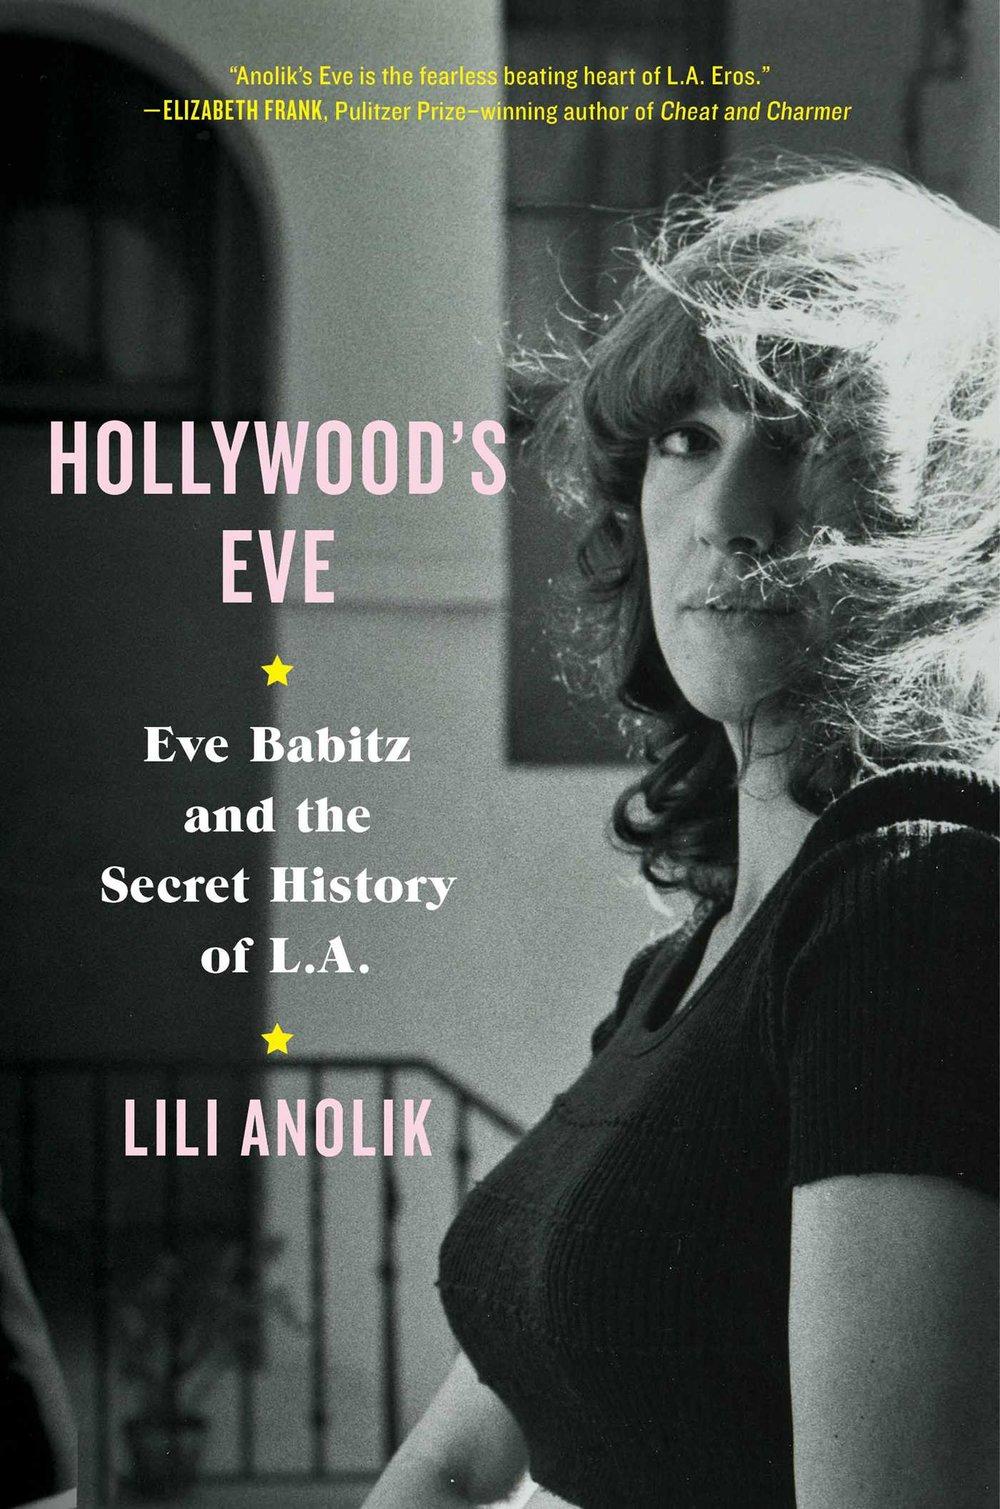 hollywoods-eve-cover-lili anolik.jpg